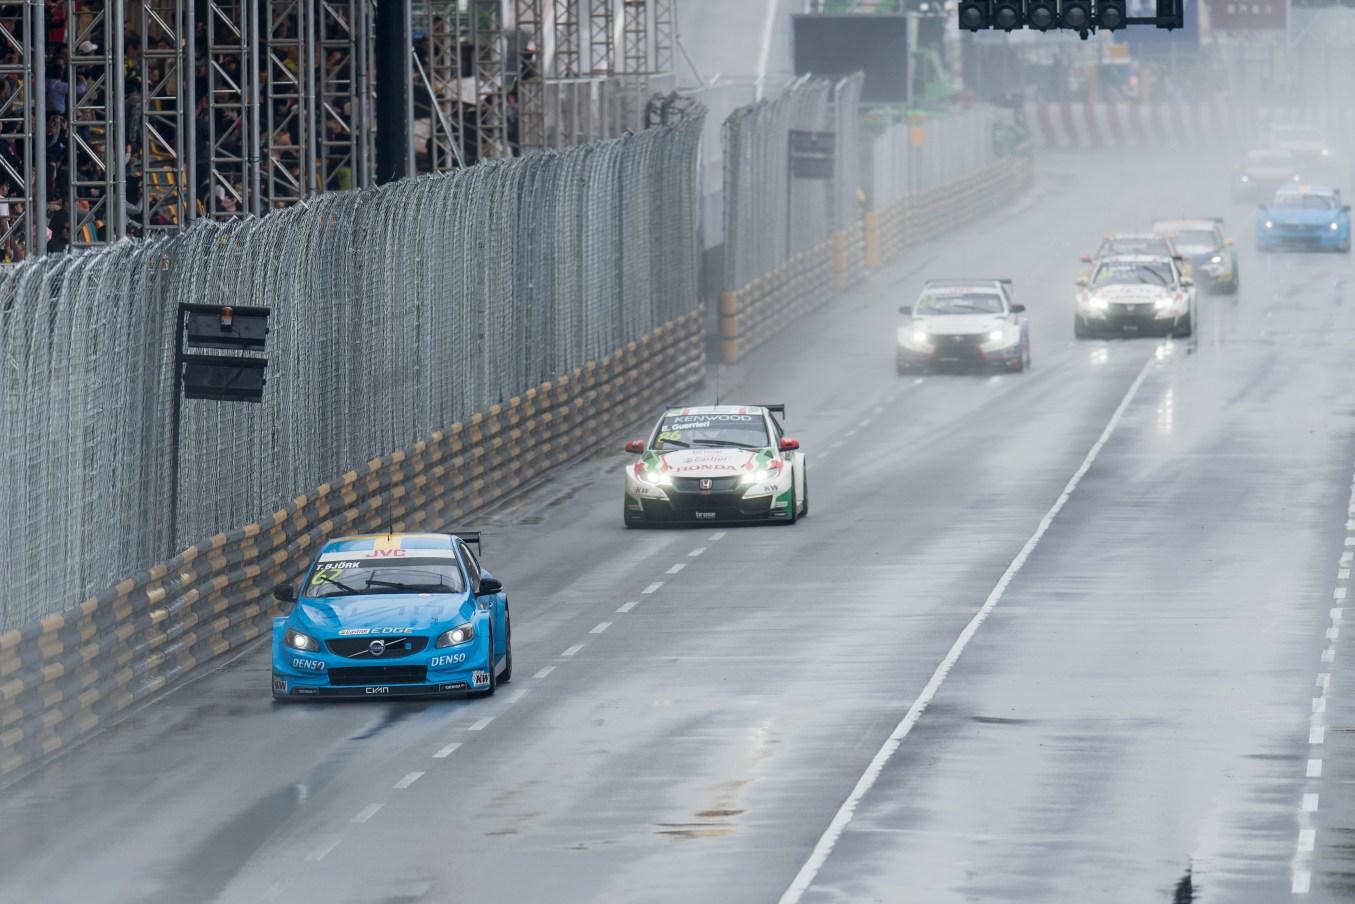 171119 WTCC in Macau with Polestar Cyan Racing. Race 2.